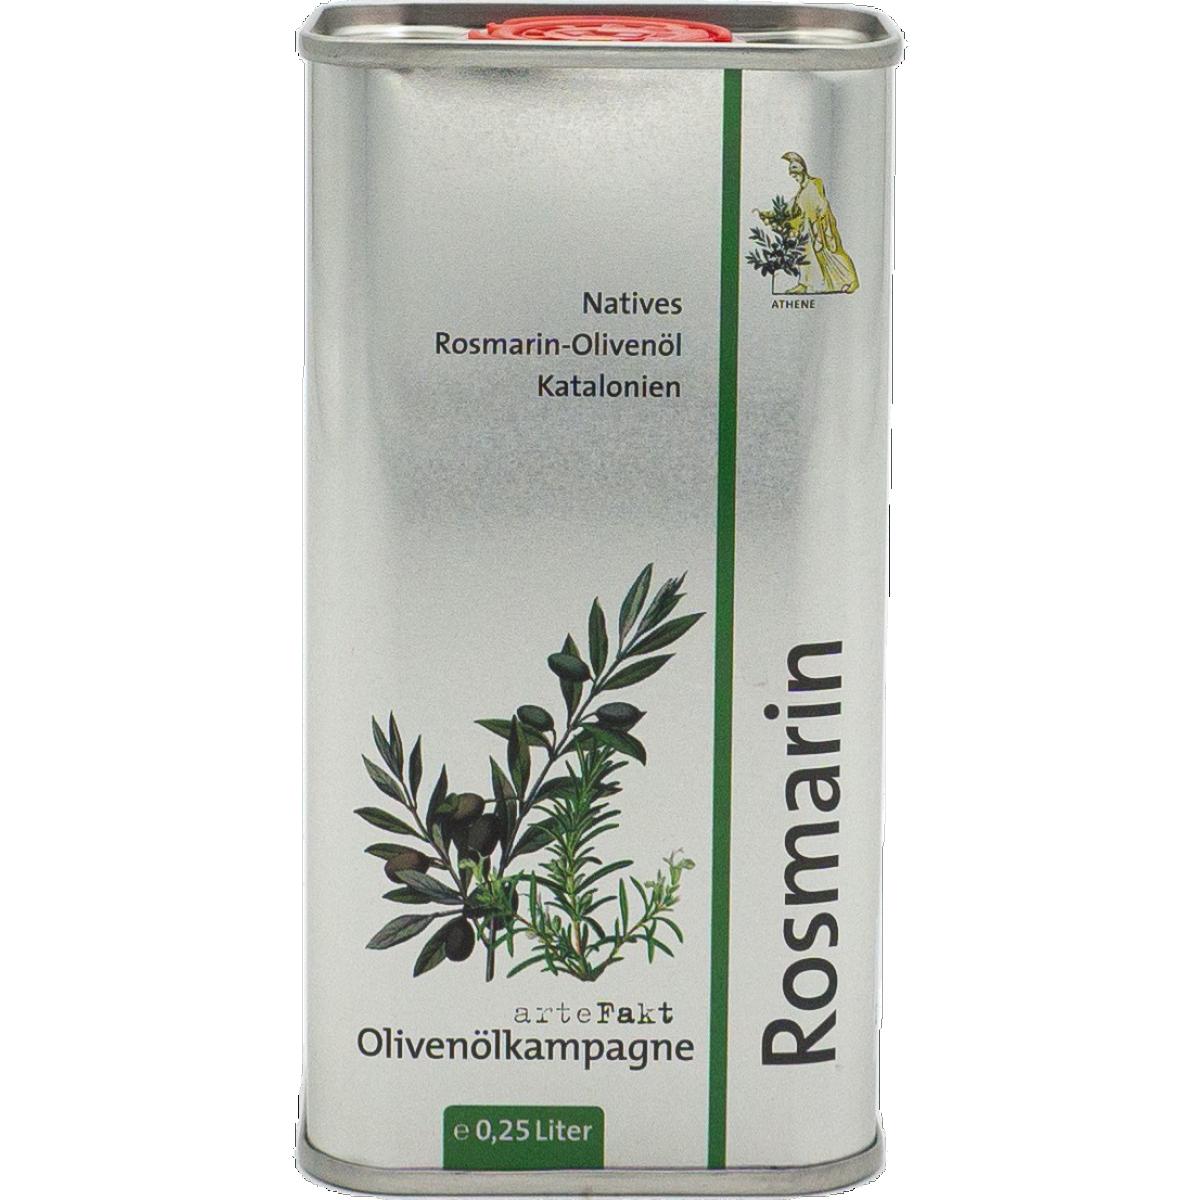 Bio Rosmarin-Olivenöl, nativ